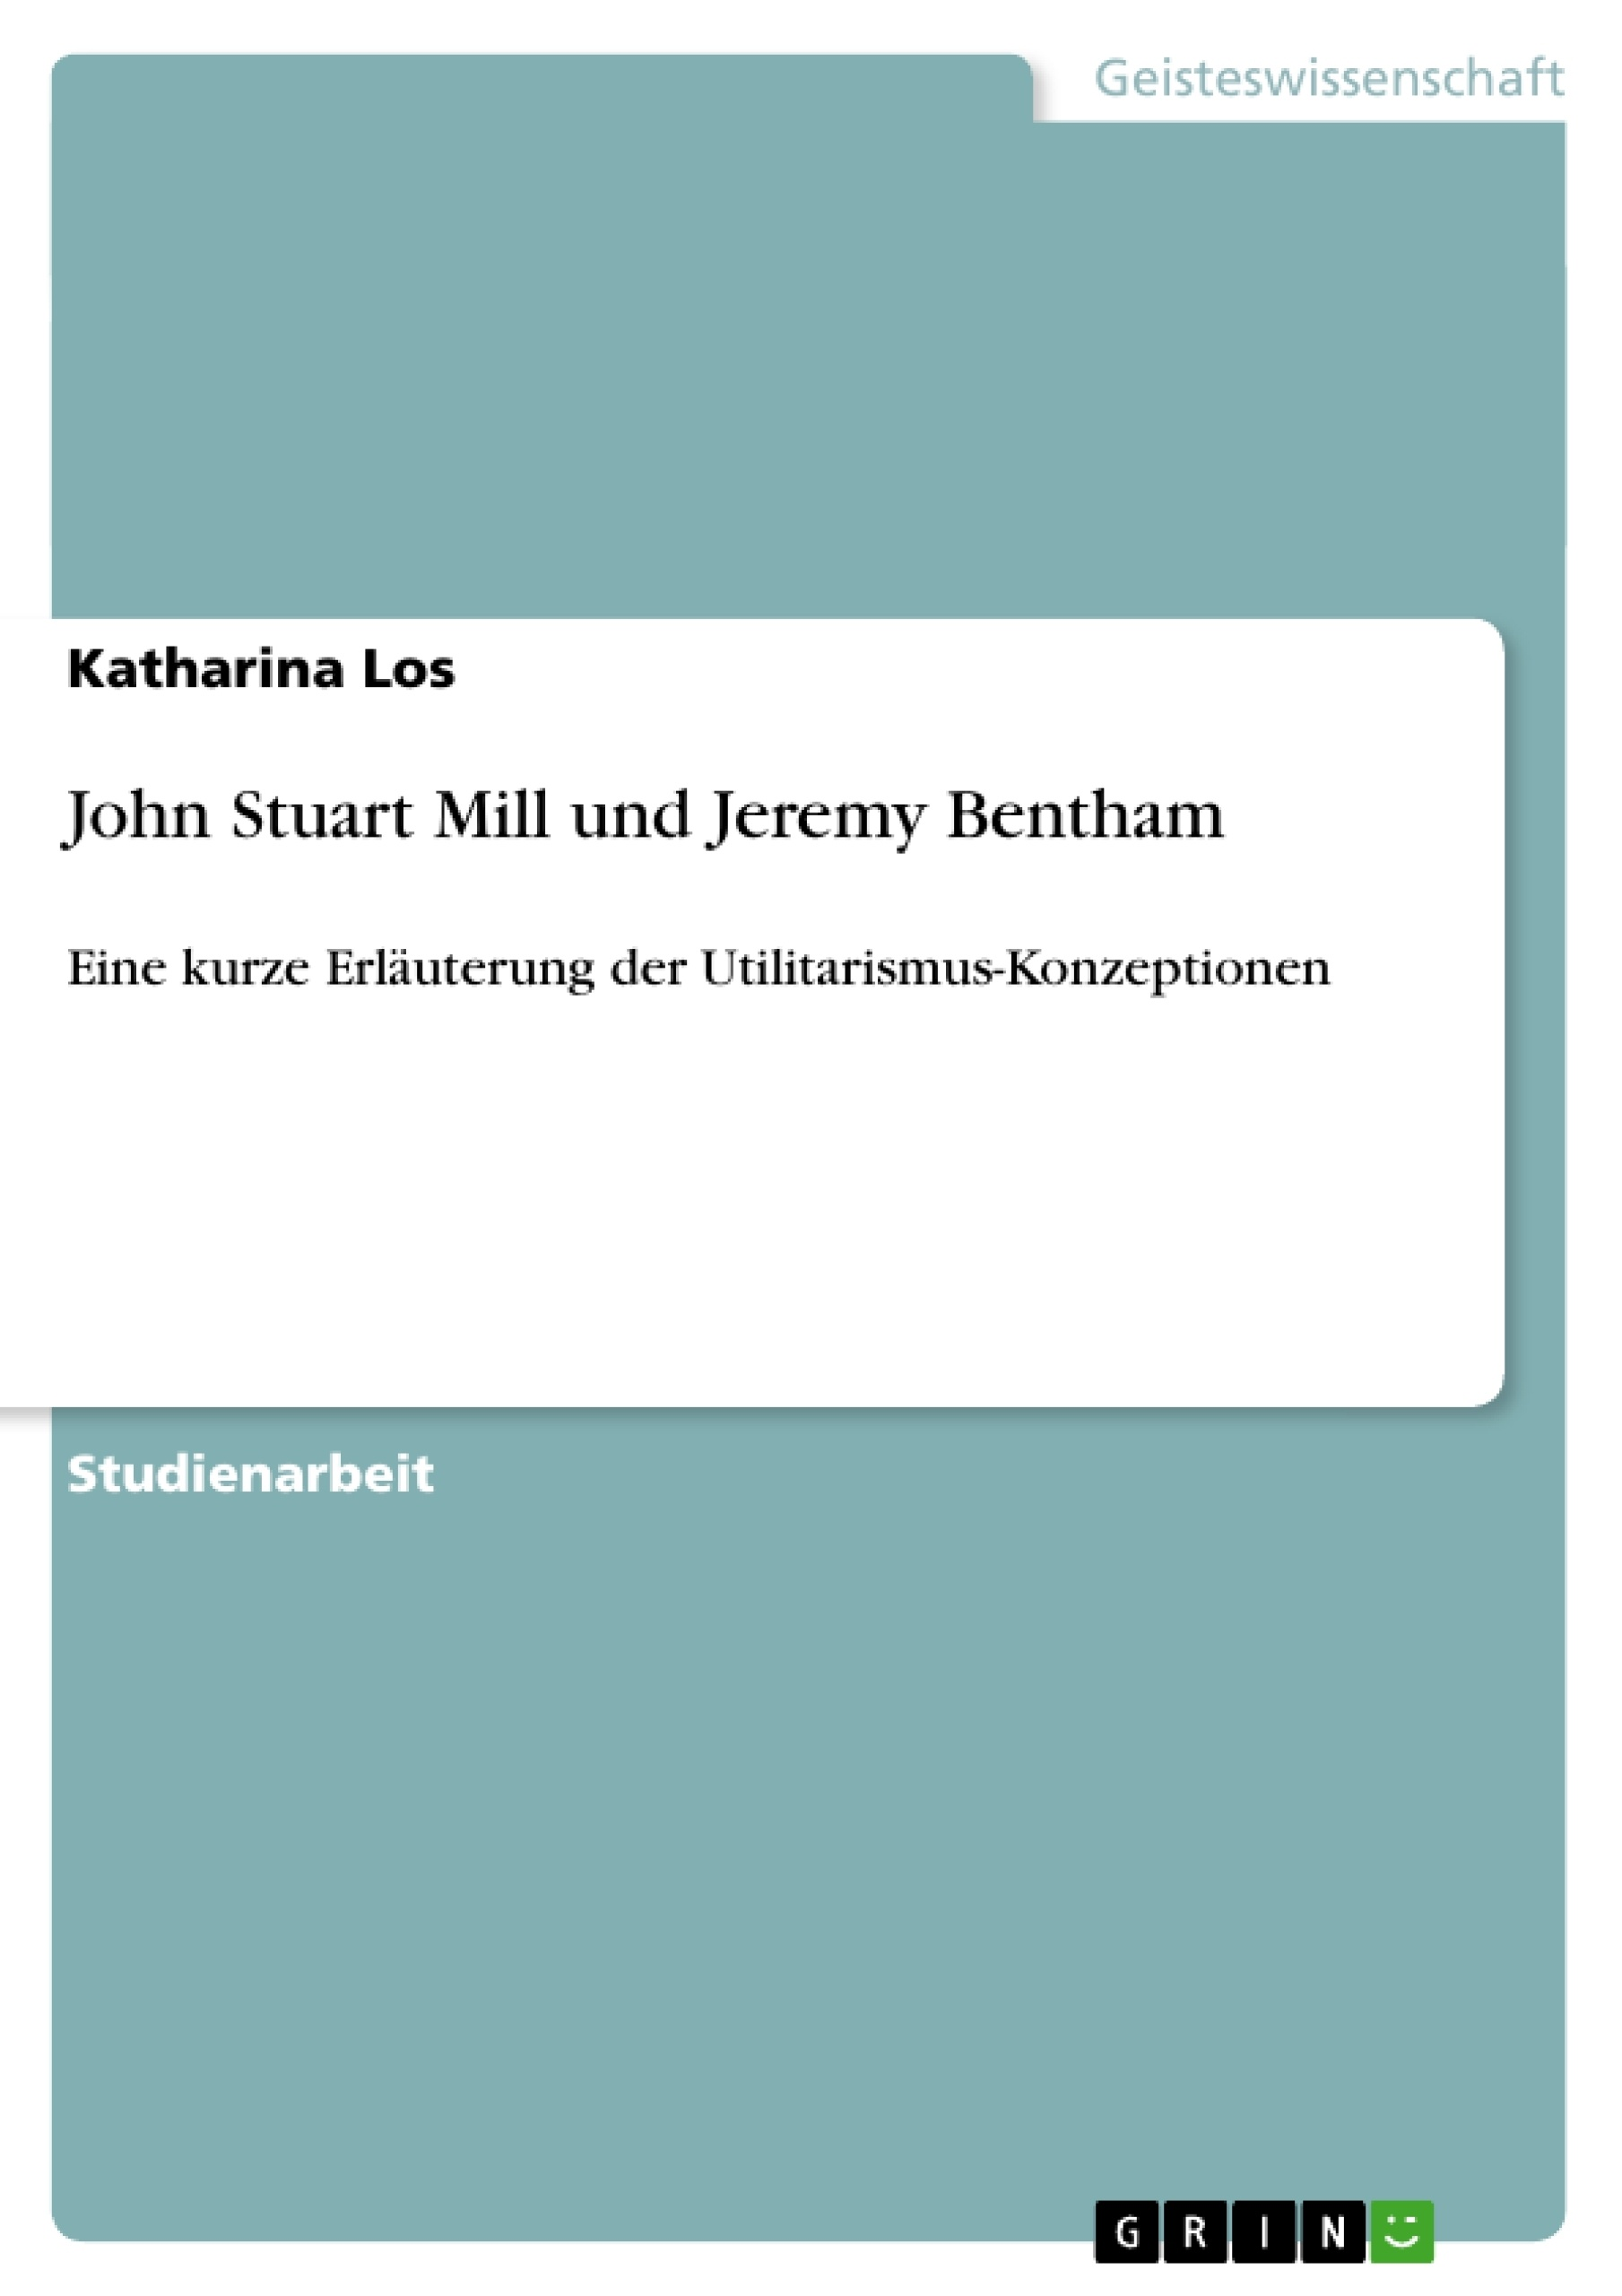 Titel: John Stuart Mill und Jeremy Bentham